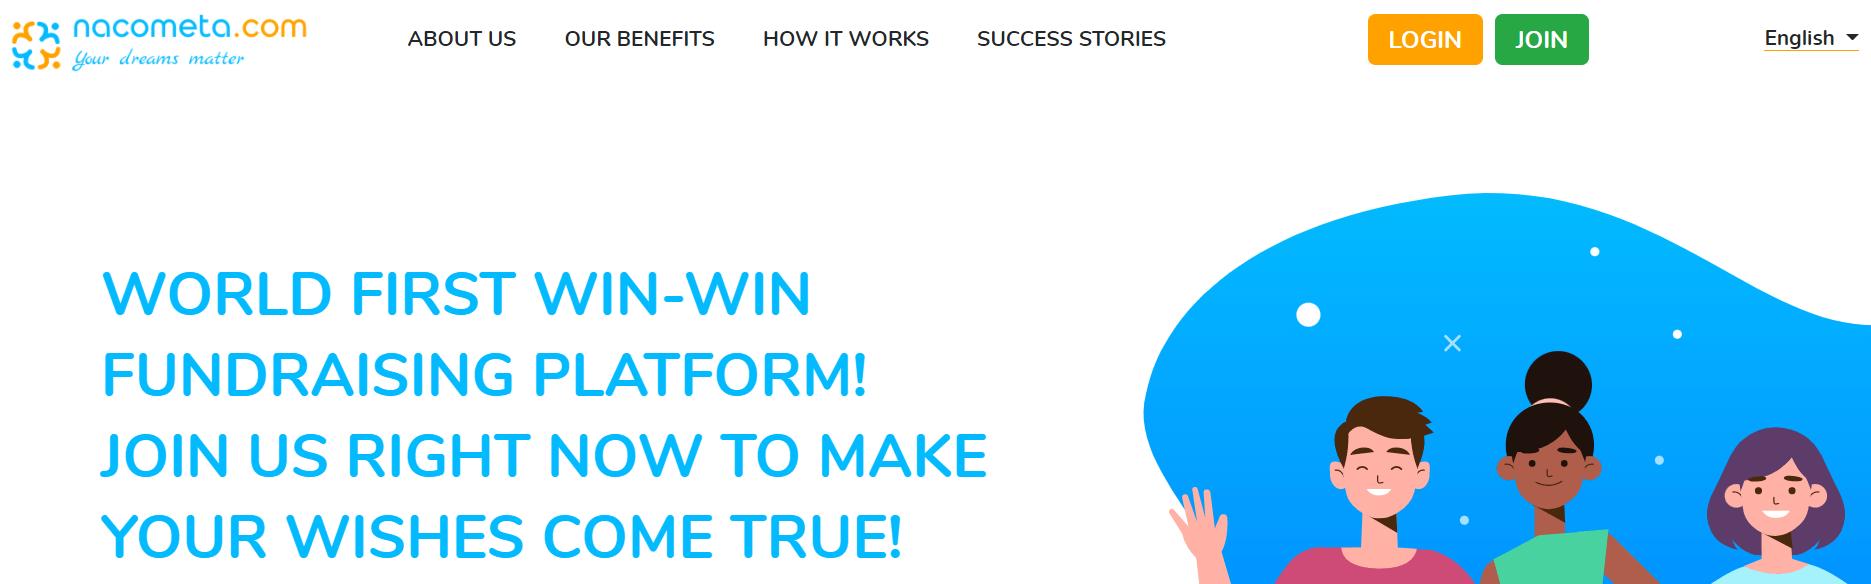 Nacometa.com